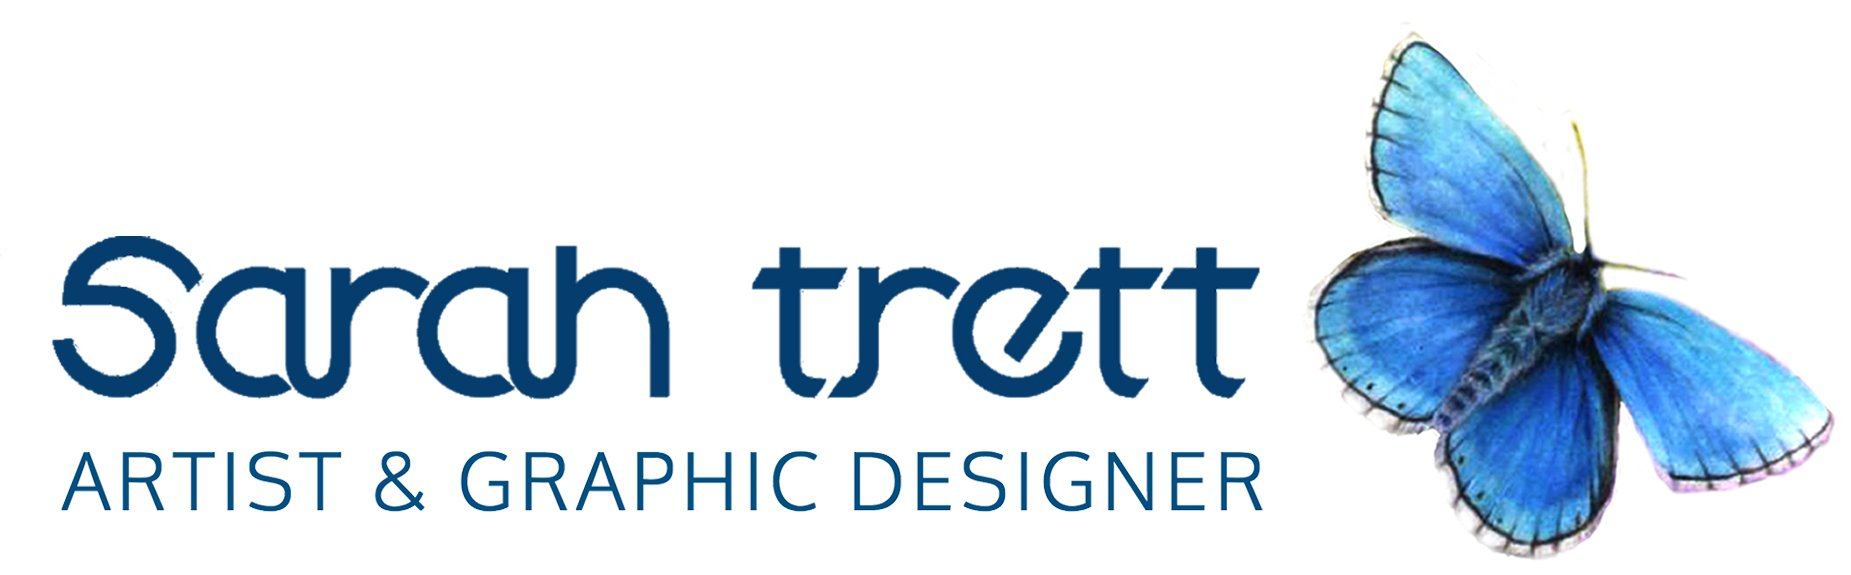 Sarah Trett - ARTIST & GRAPHIC DESIGNER